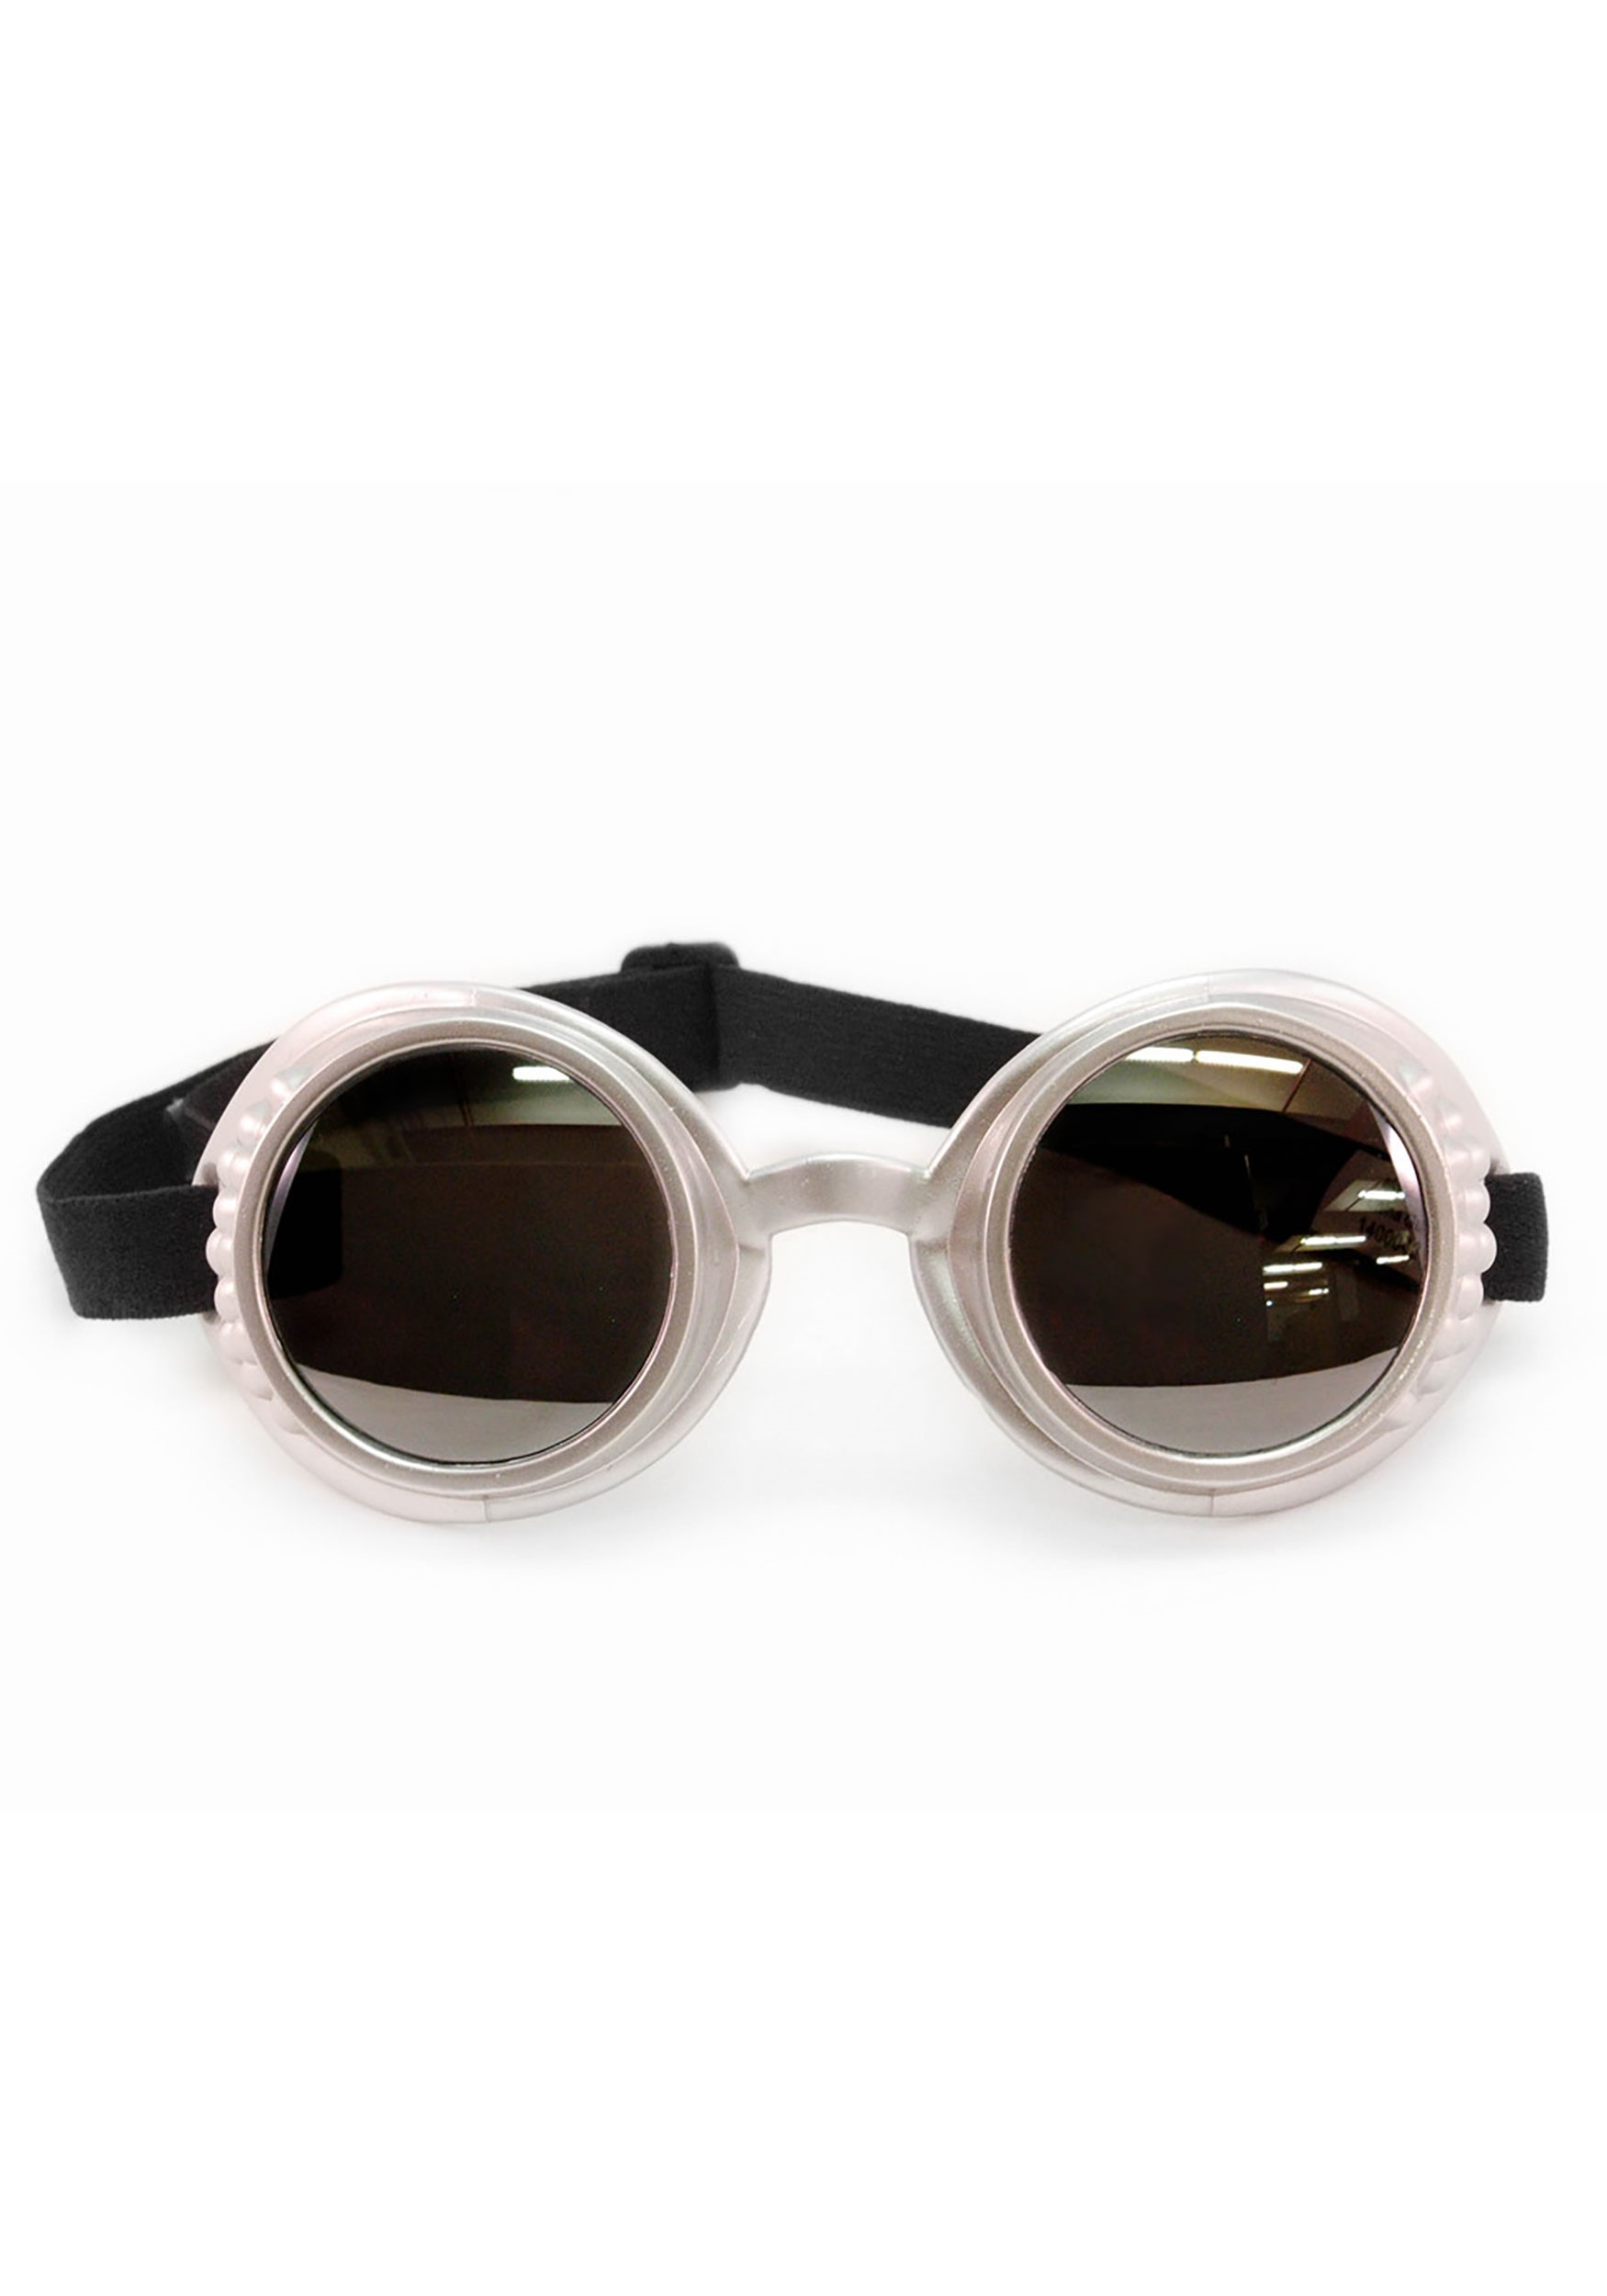 Silver/Mirror Atomic Ray Goggles